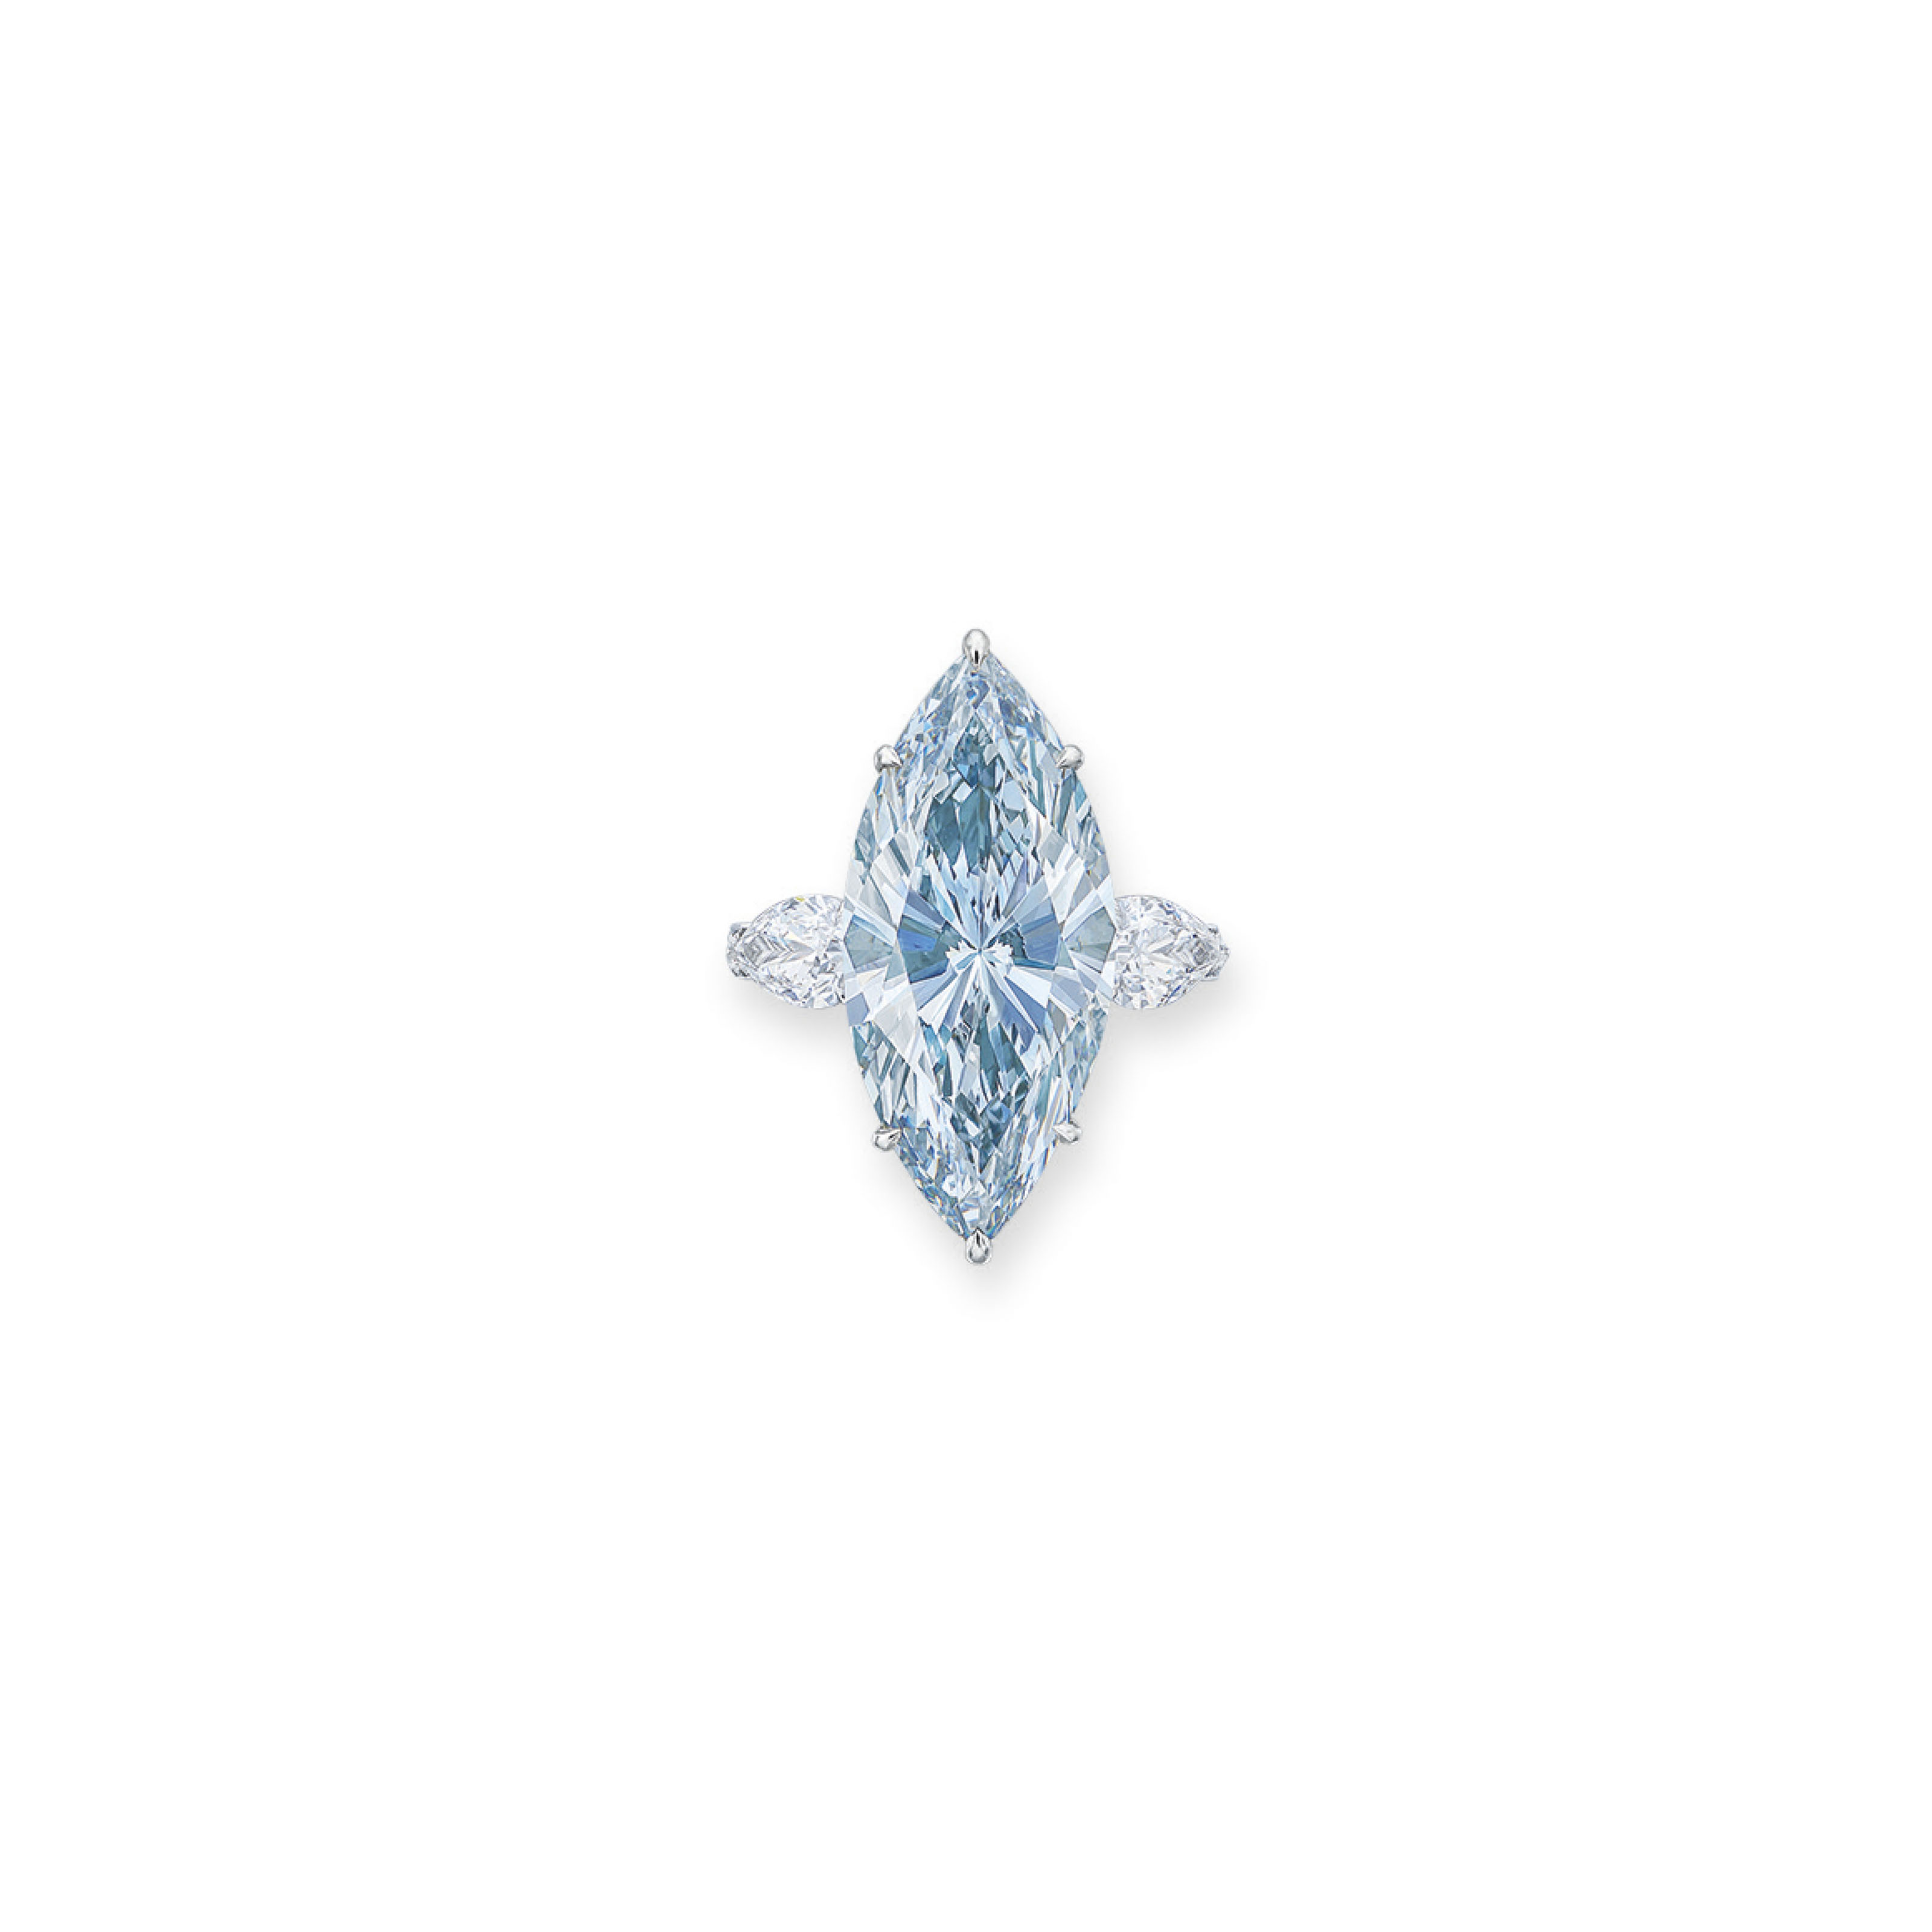 SUPERB COLOURED DIAMOND AND DIAMOND RING